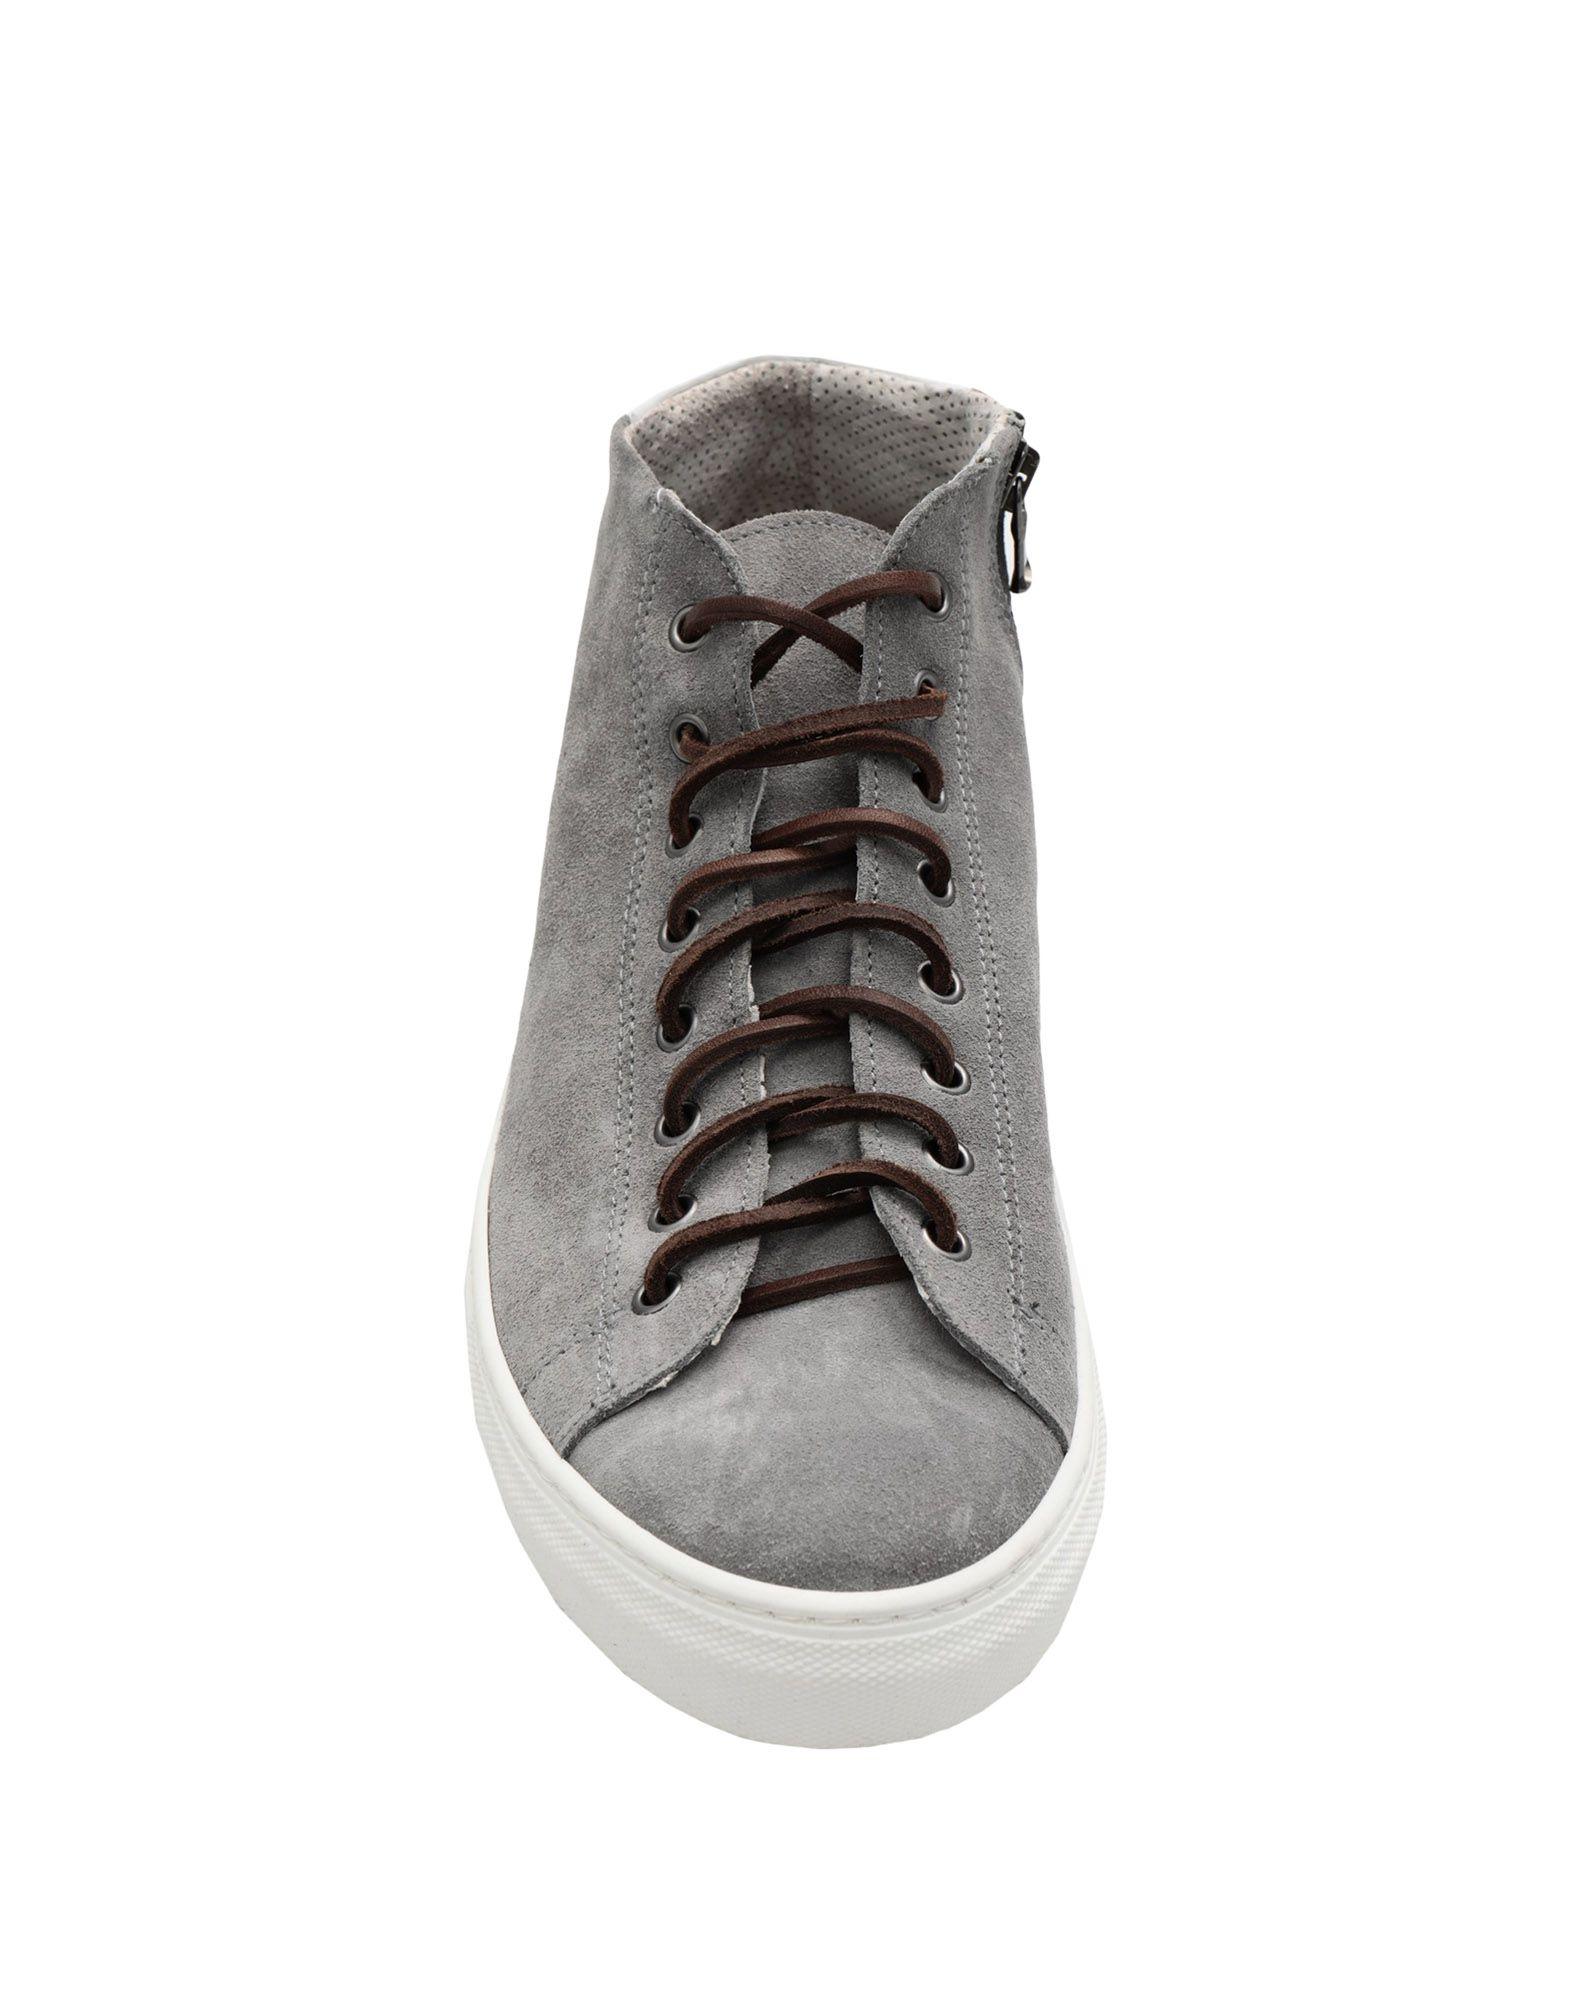 Moda Moda Moda Sneakers Edwa Uomo - 11458255VC cb32a0